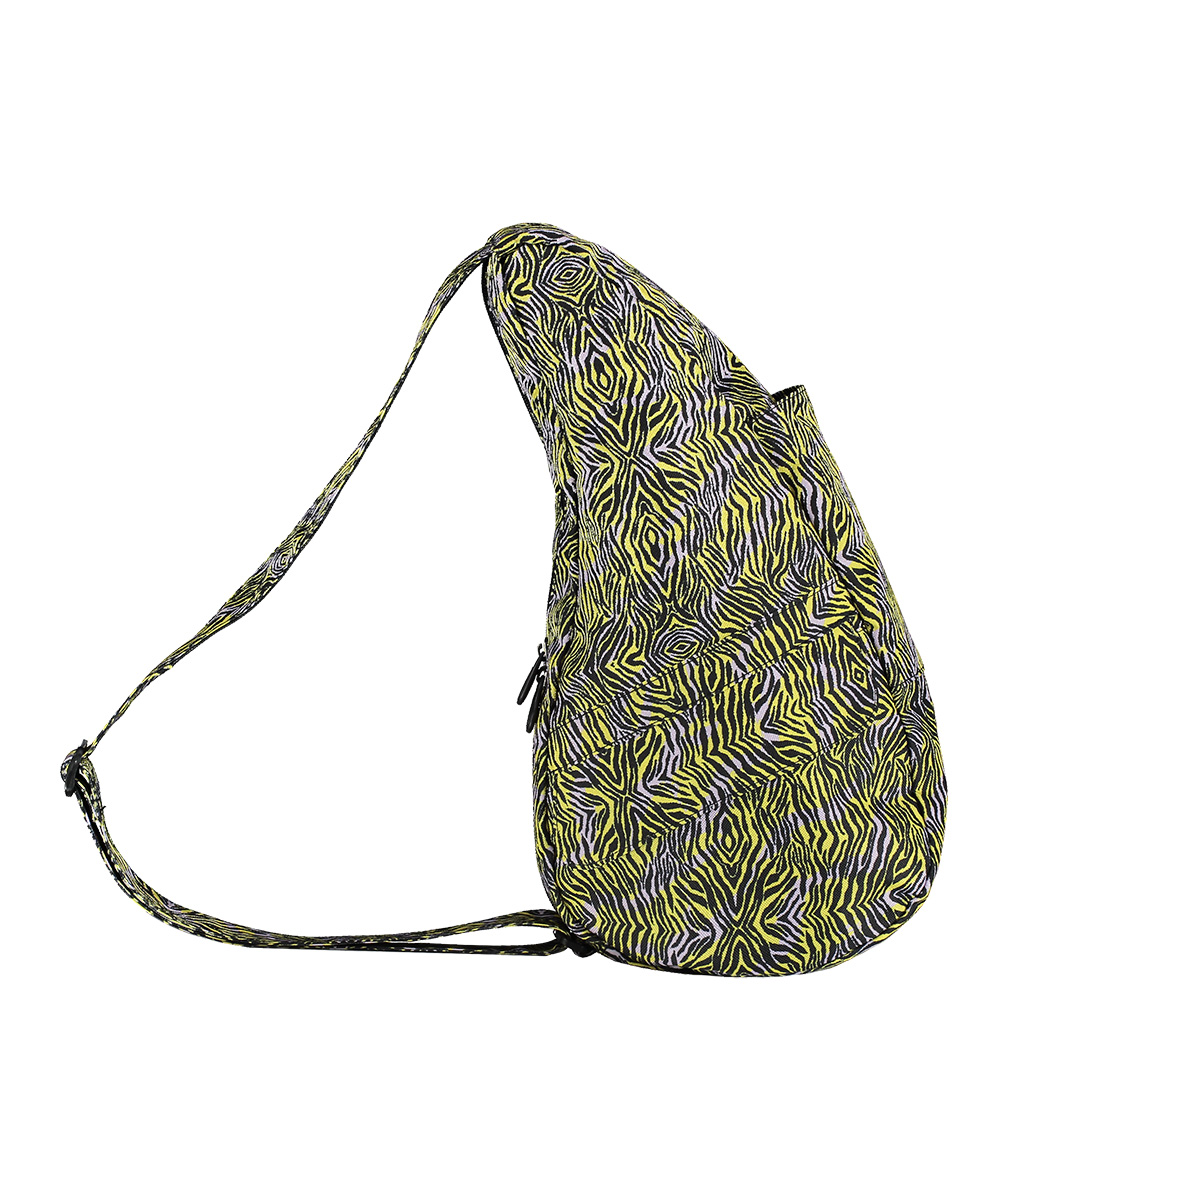 Healthy Back Bag/ヘルシーバックバッグ/ショルダーバッグ/ボディバッグ/旅行バッグ/軽量/レディース/メンズ ヘルシーバックバッグ プリント Sサイズ アーバンゼブラ